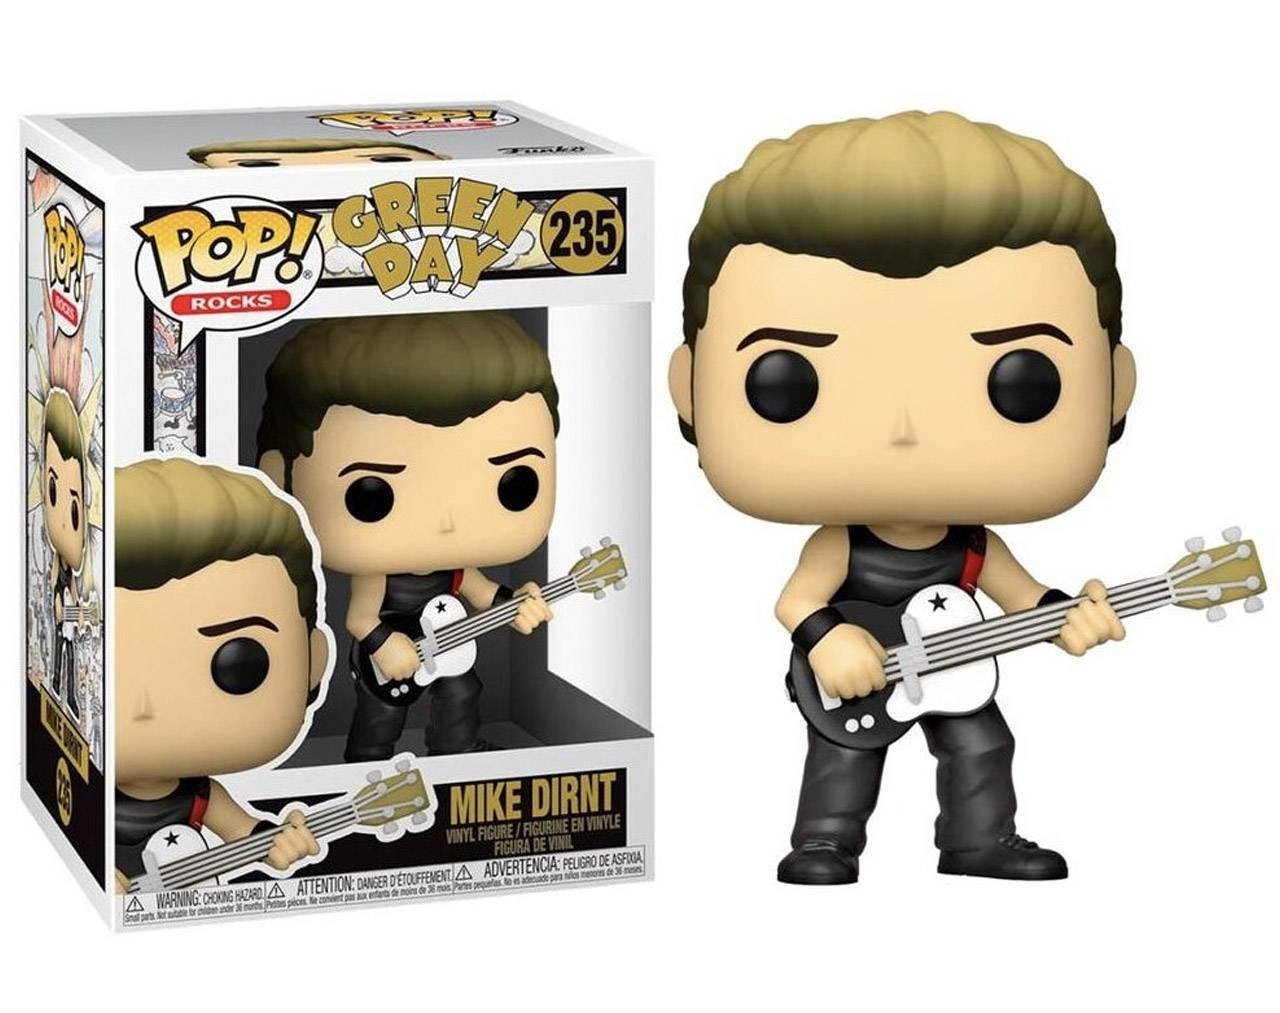 Mike Dirnt (Green Day) Pop! Vinyl